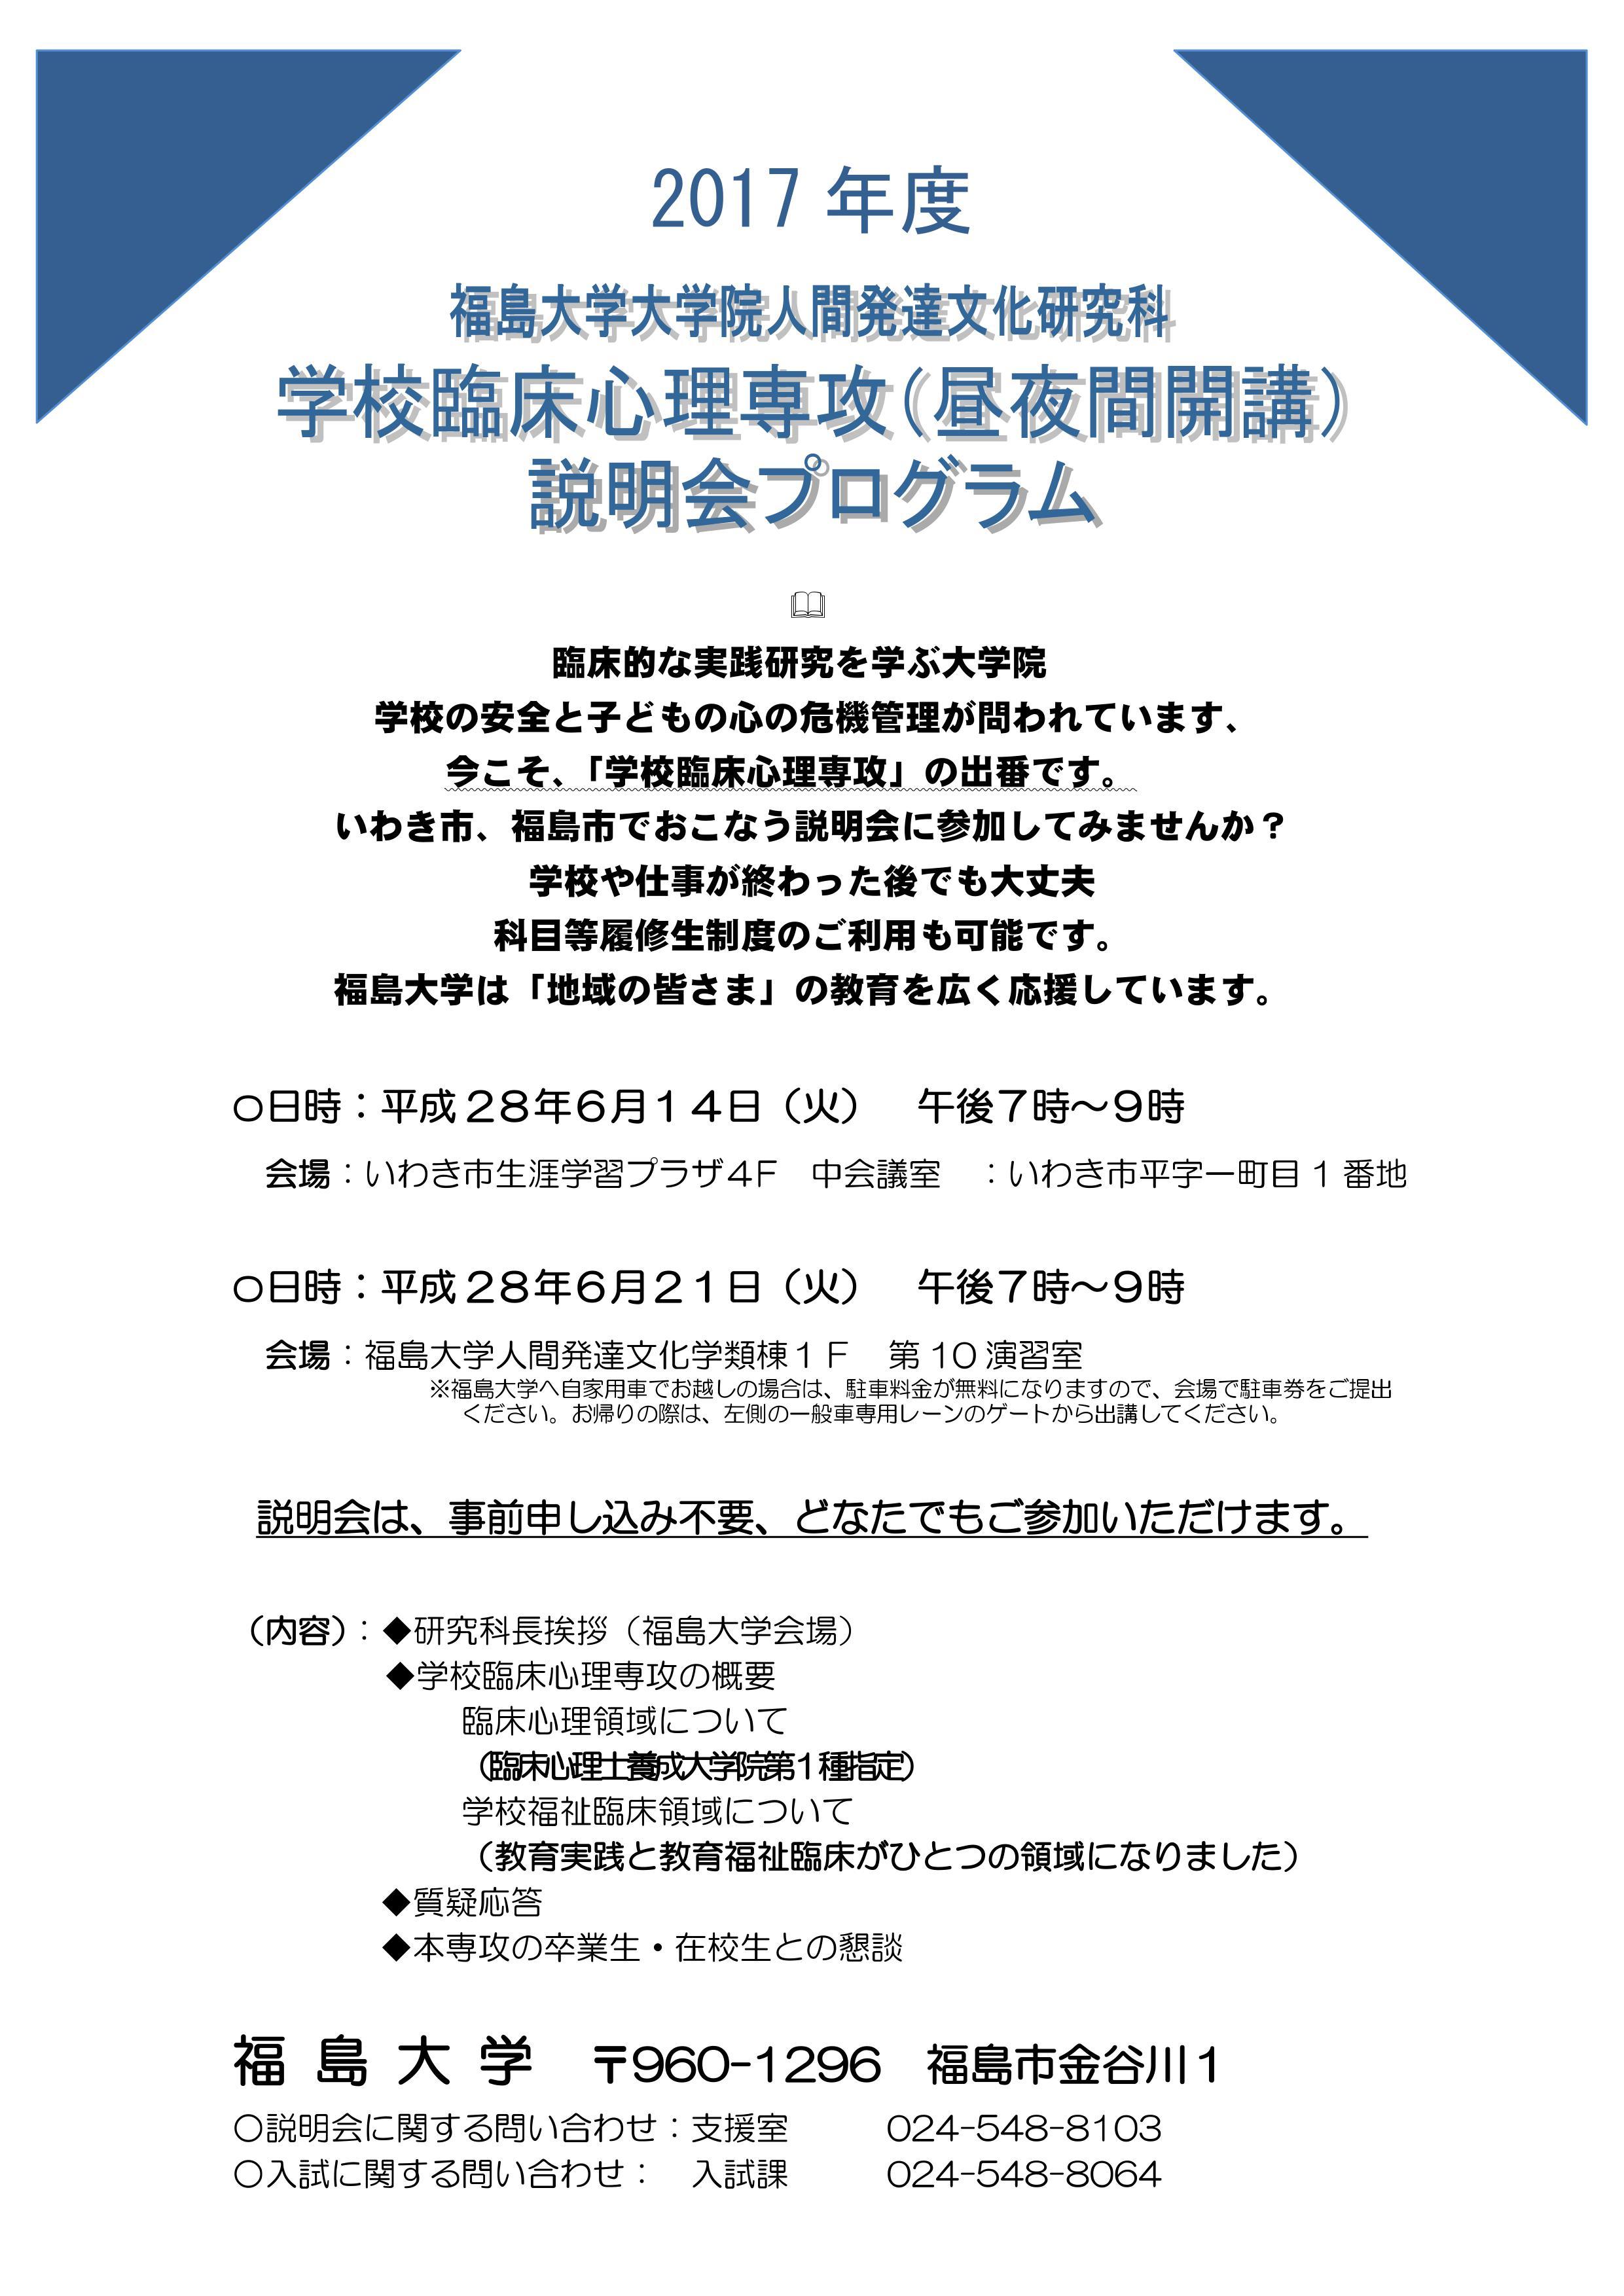 H29_rinsyosetumeikai_leaflet